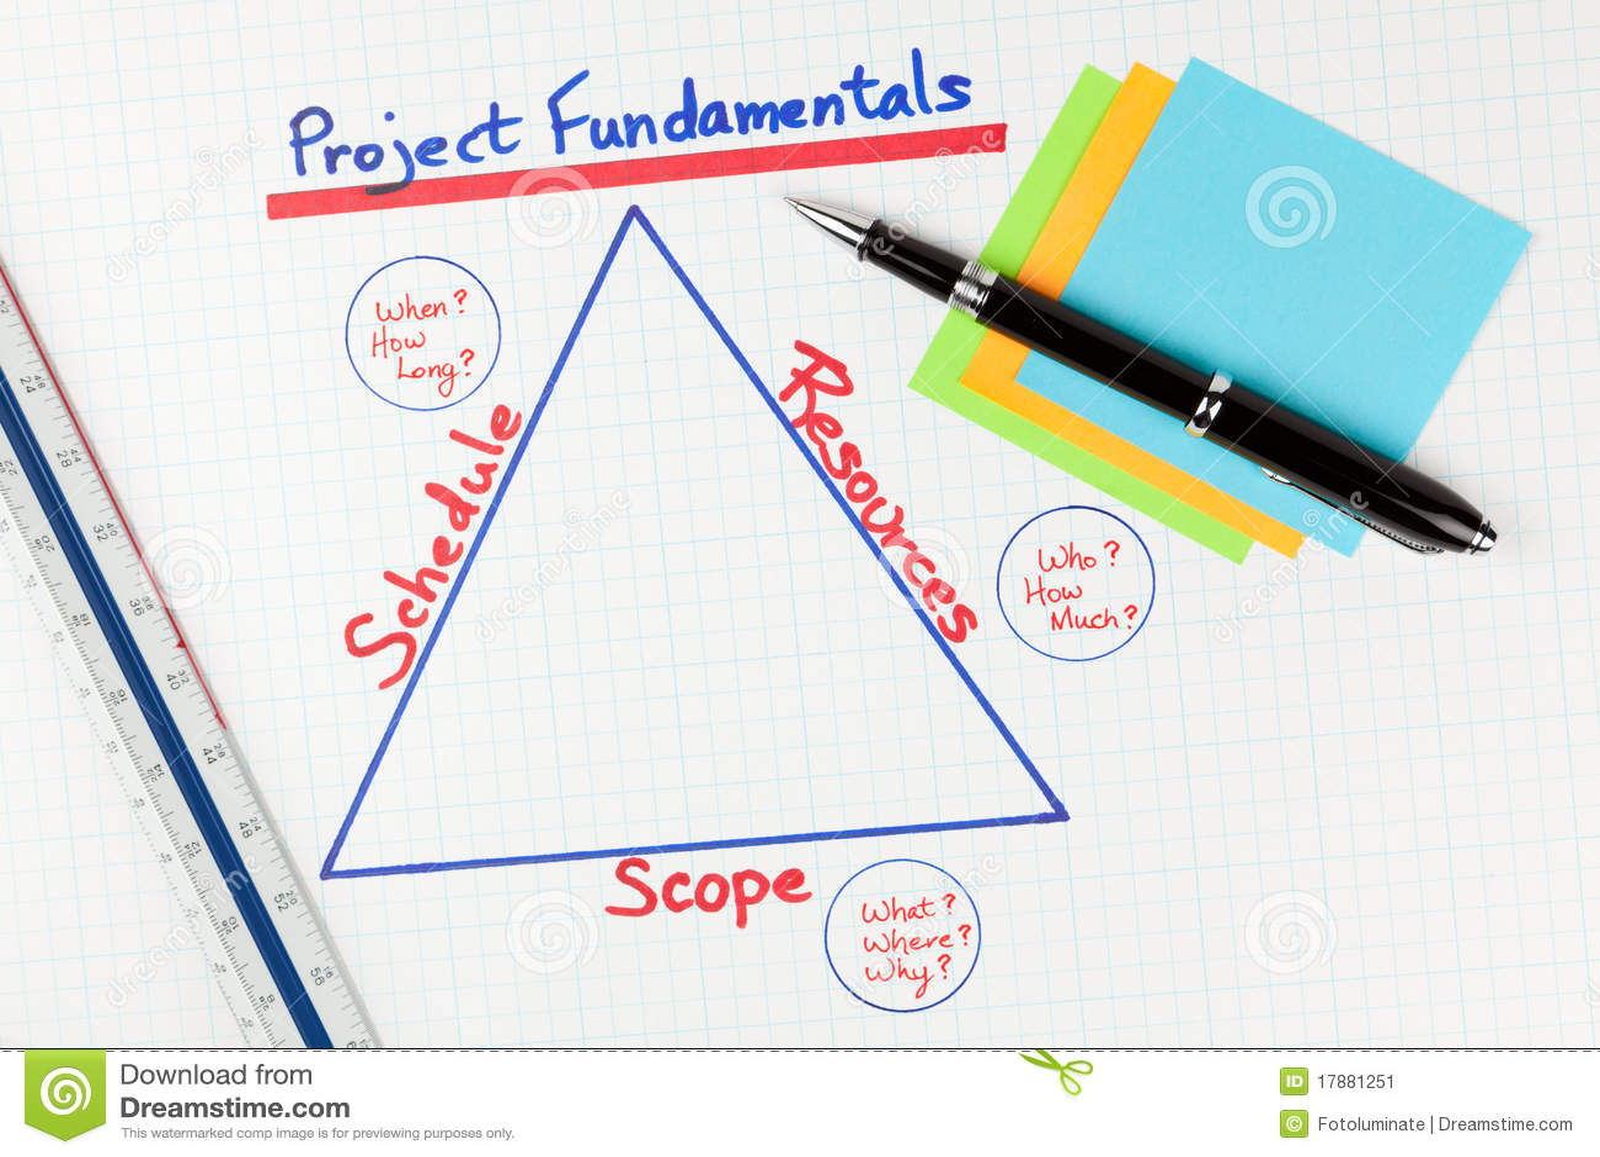 Project Management Fundamentals Diagram Stock Image